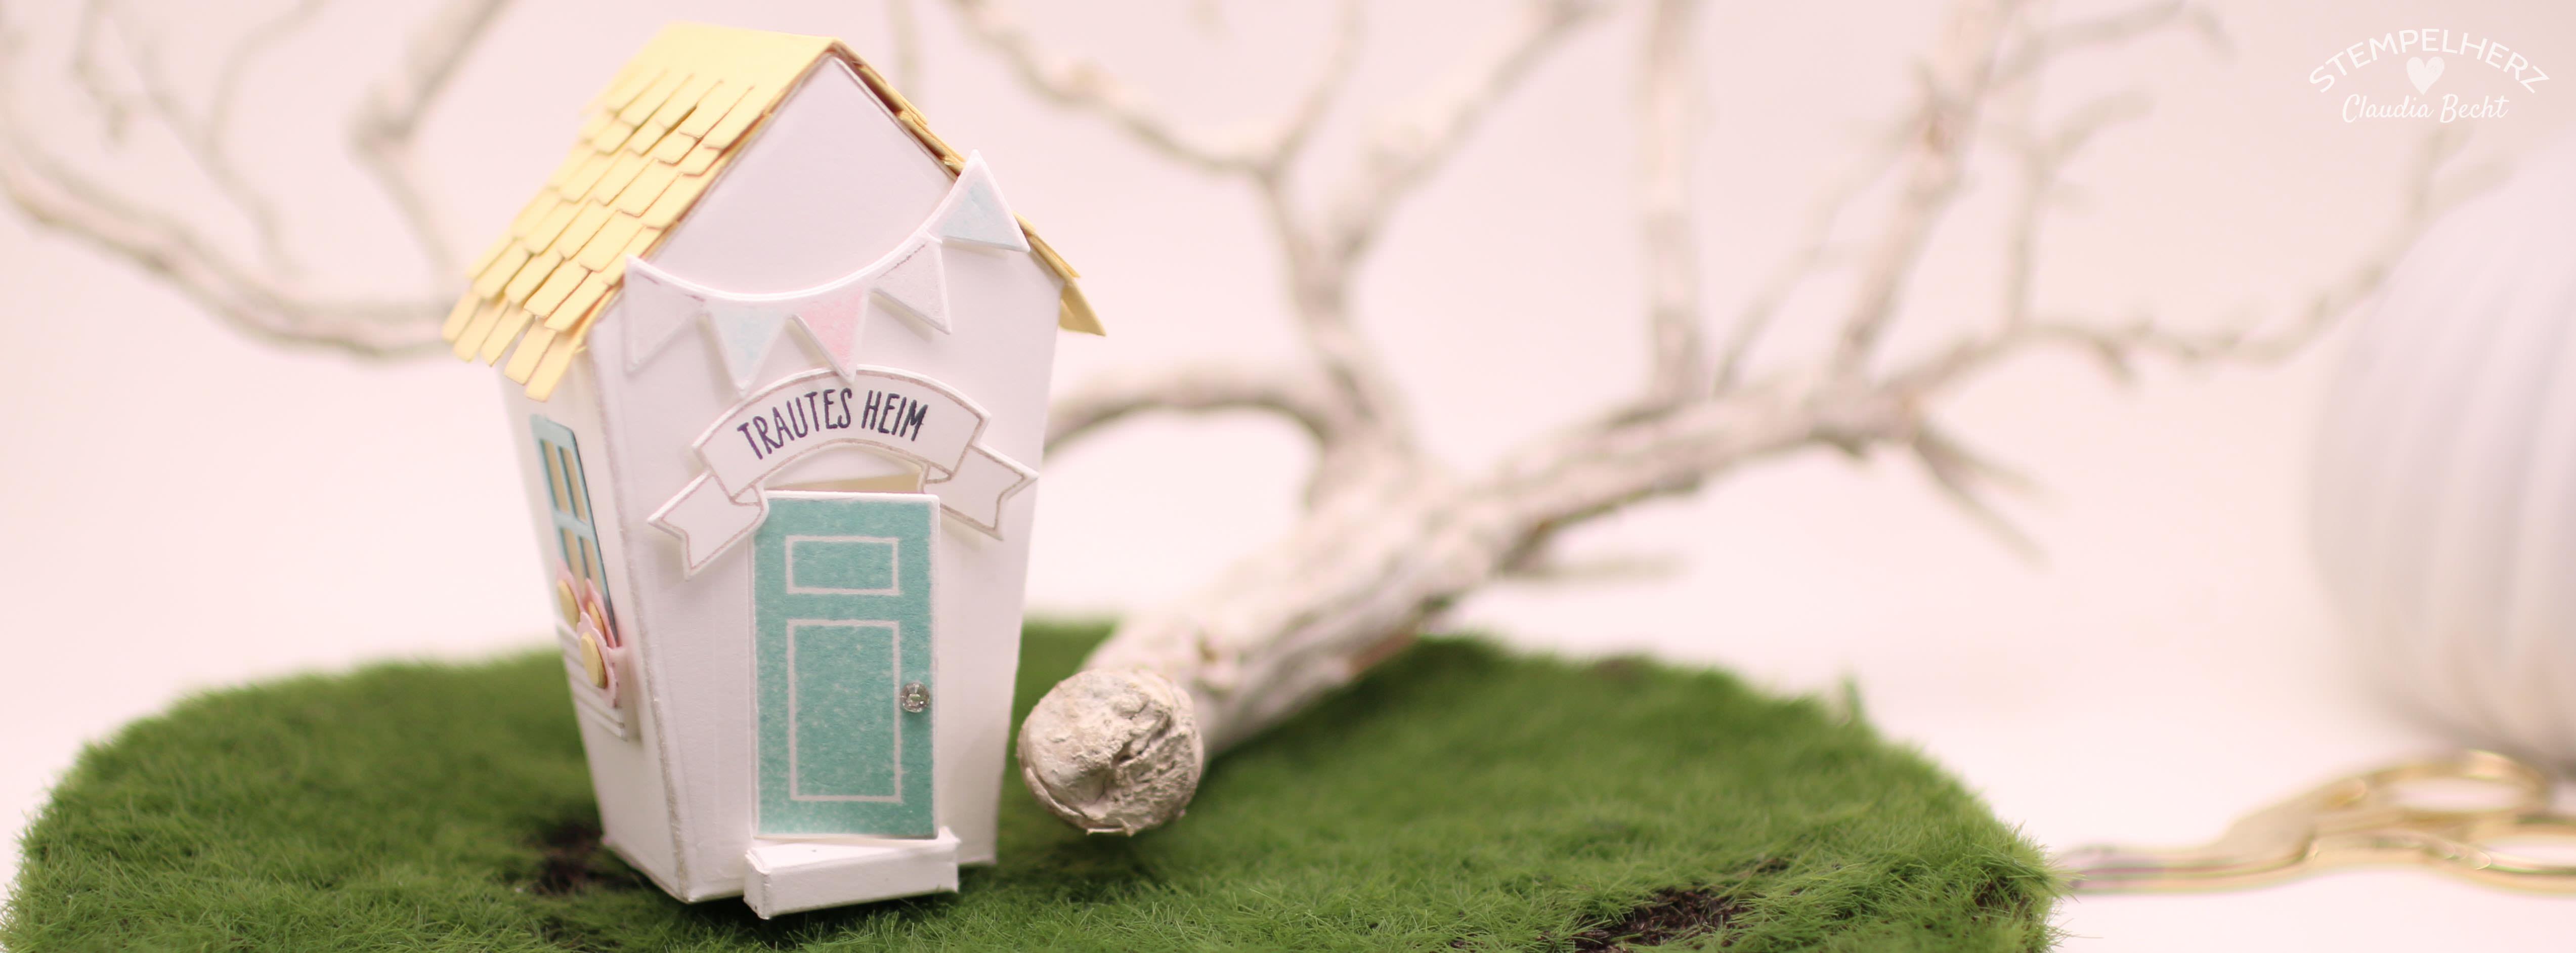 Inspiration-&-Art-Blog-Hop-Verpackung-Box-Haus-Stempelset-Ein-Haus-fuer-alle-Faelle-Home-sweet-Home-I&A-Lieblingsartikel-02